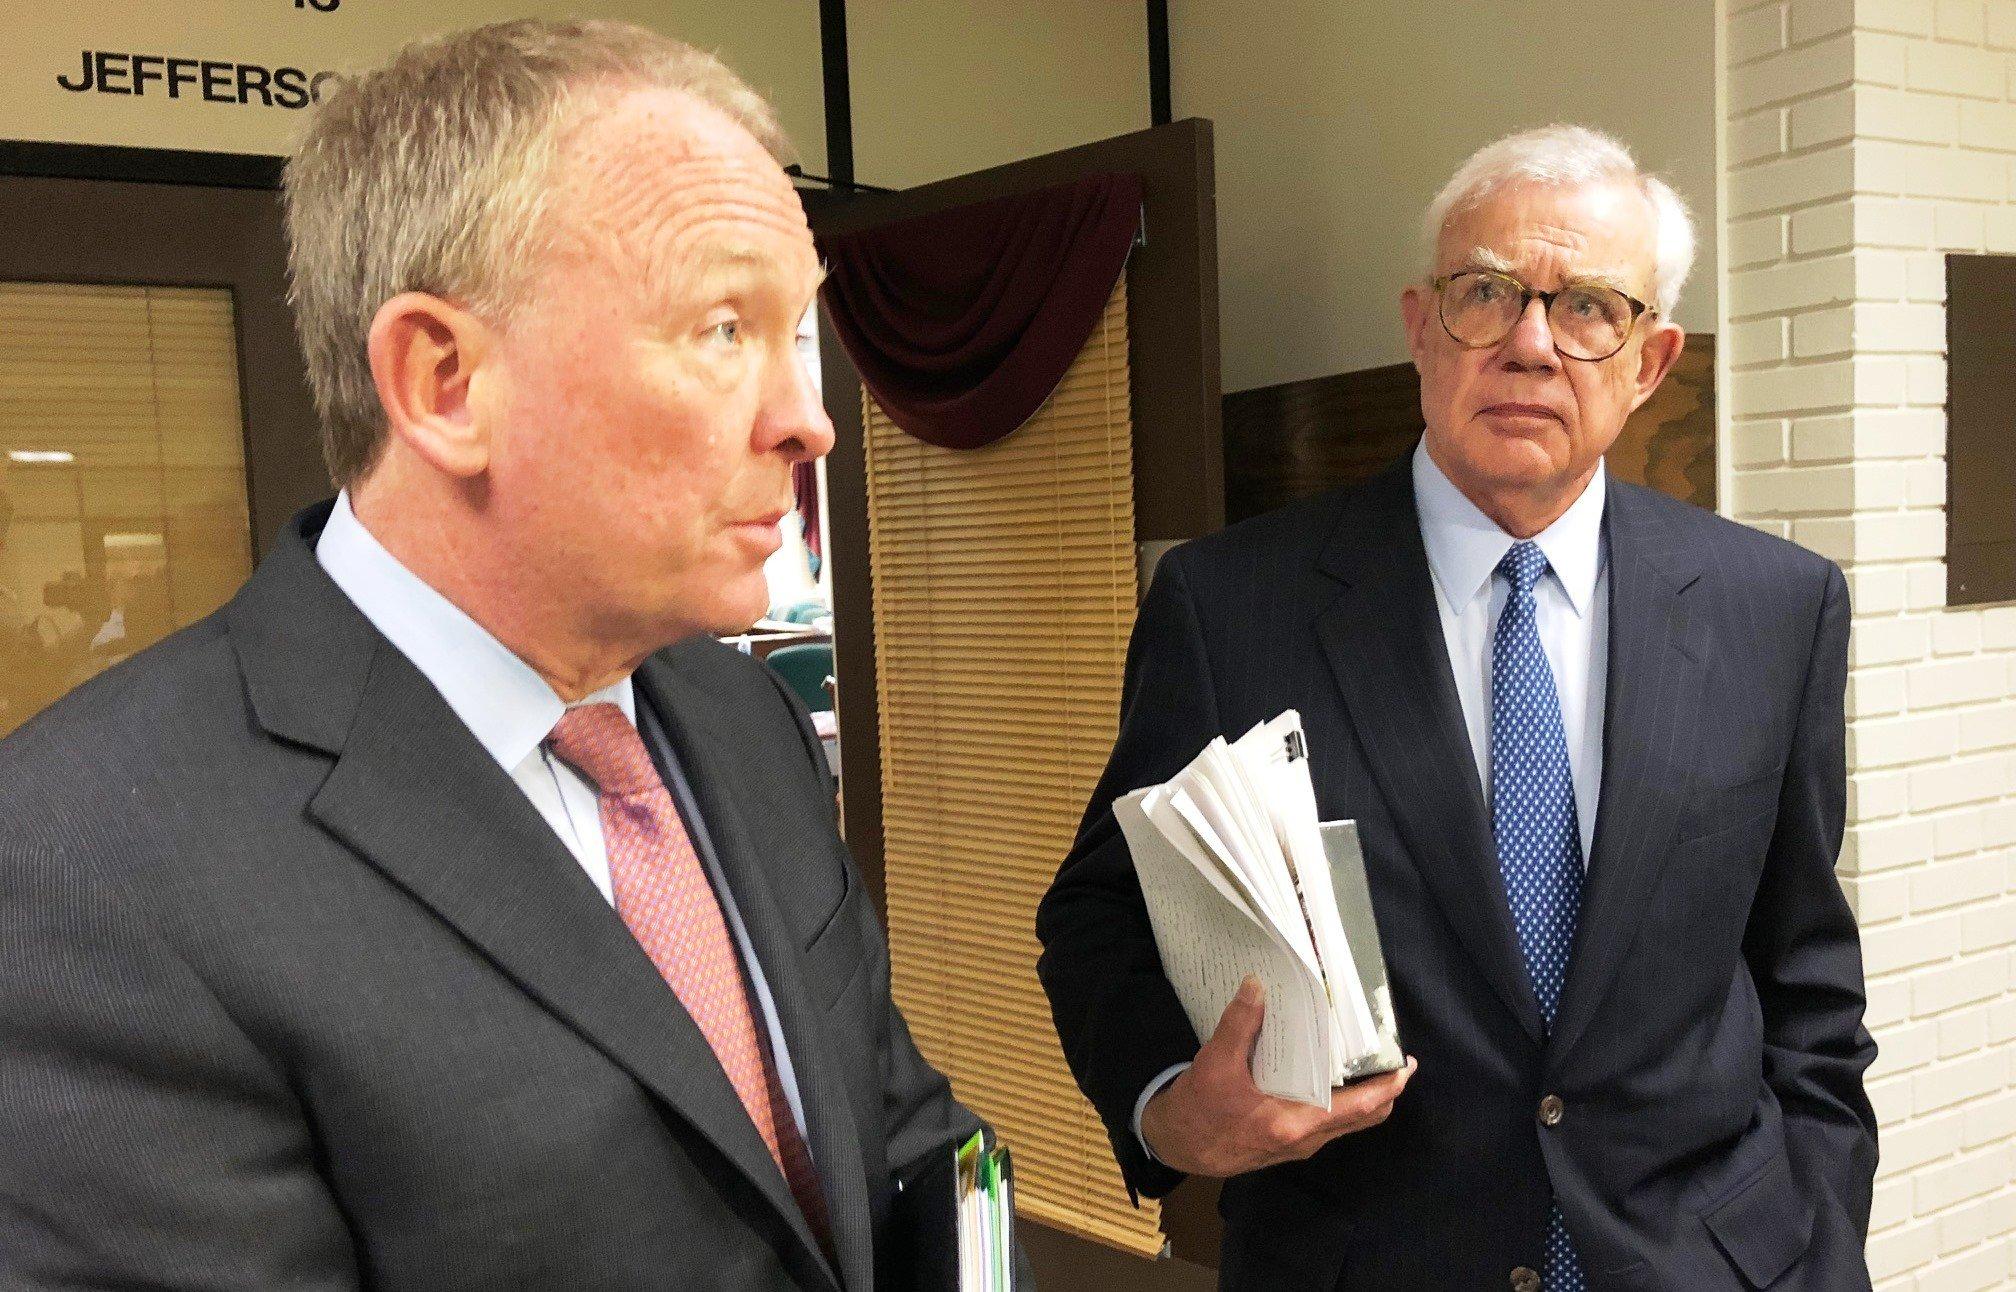 U of L trustees chairman David Grissom, right, and interim President Greg Postel. Nov. 20, 2017